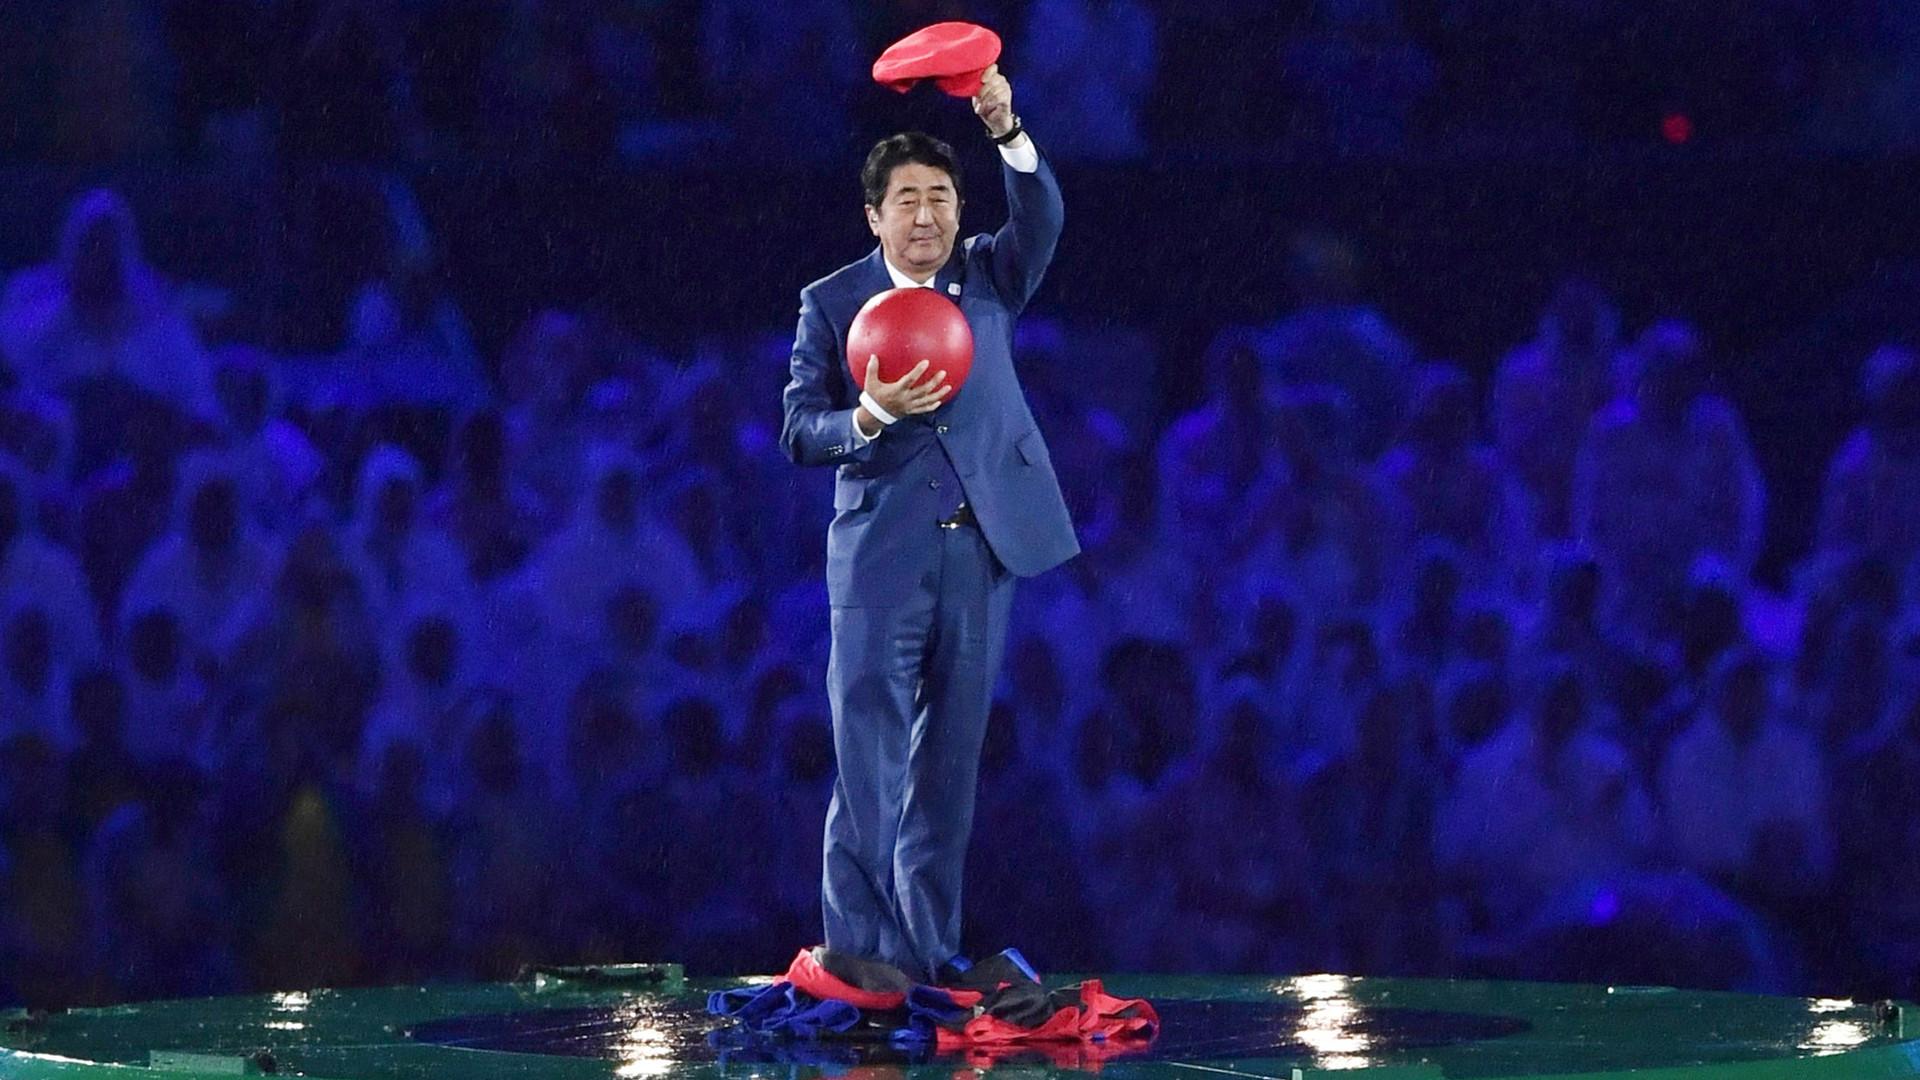 Japanese Prime Minister Shinzo Abe Wows Rio Finale As